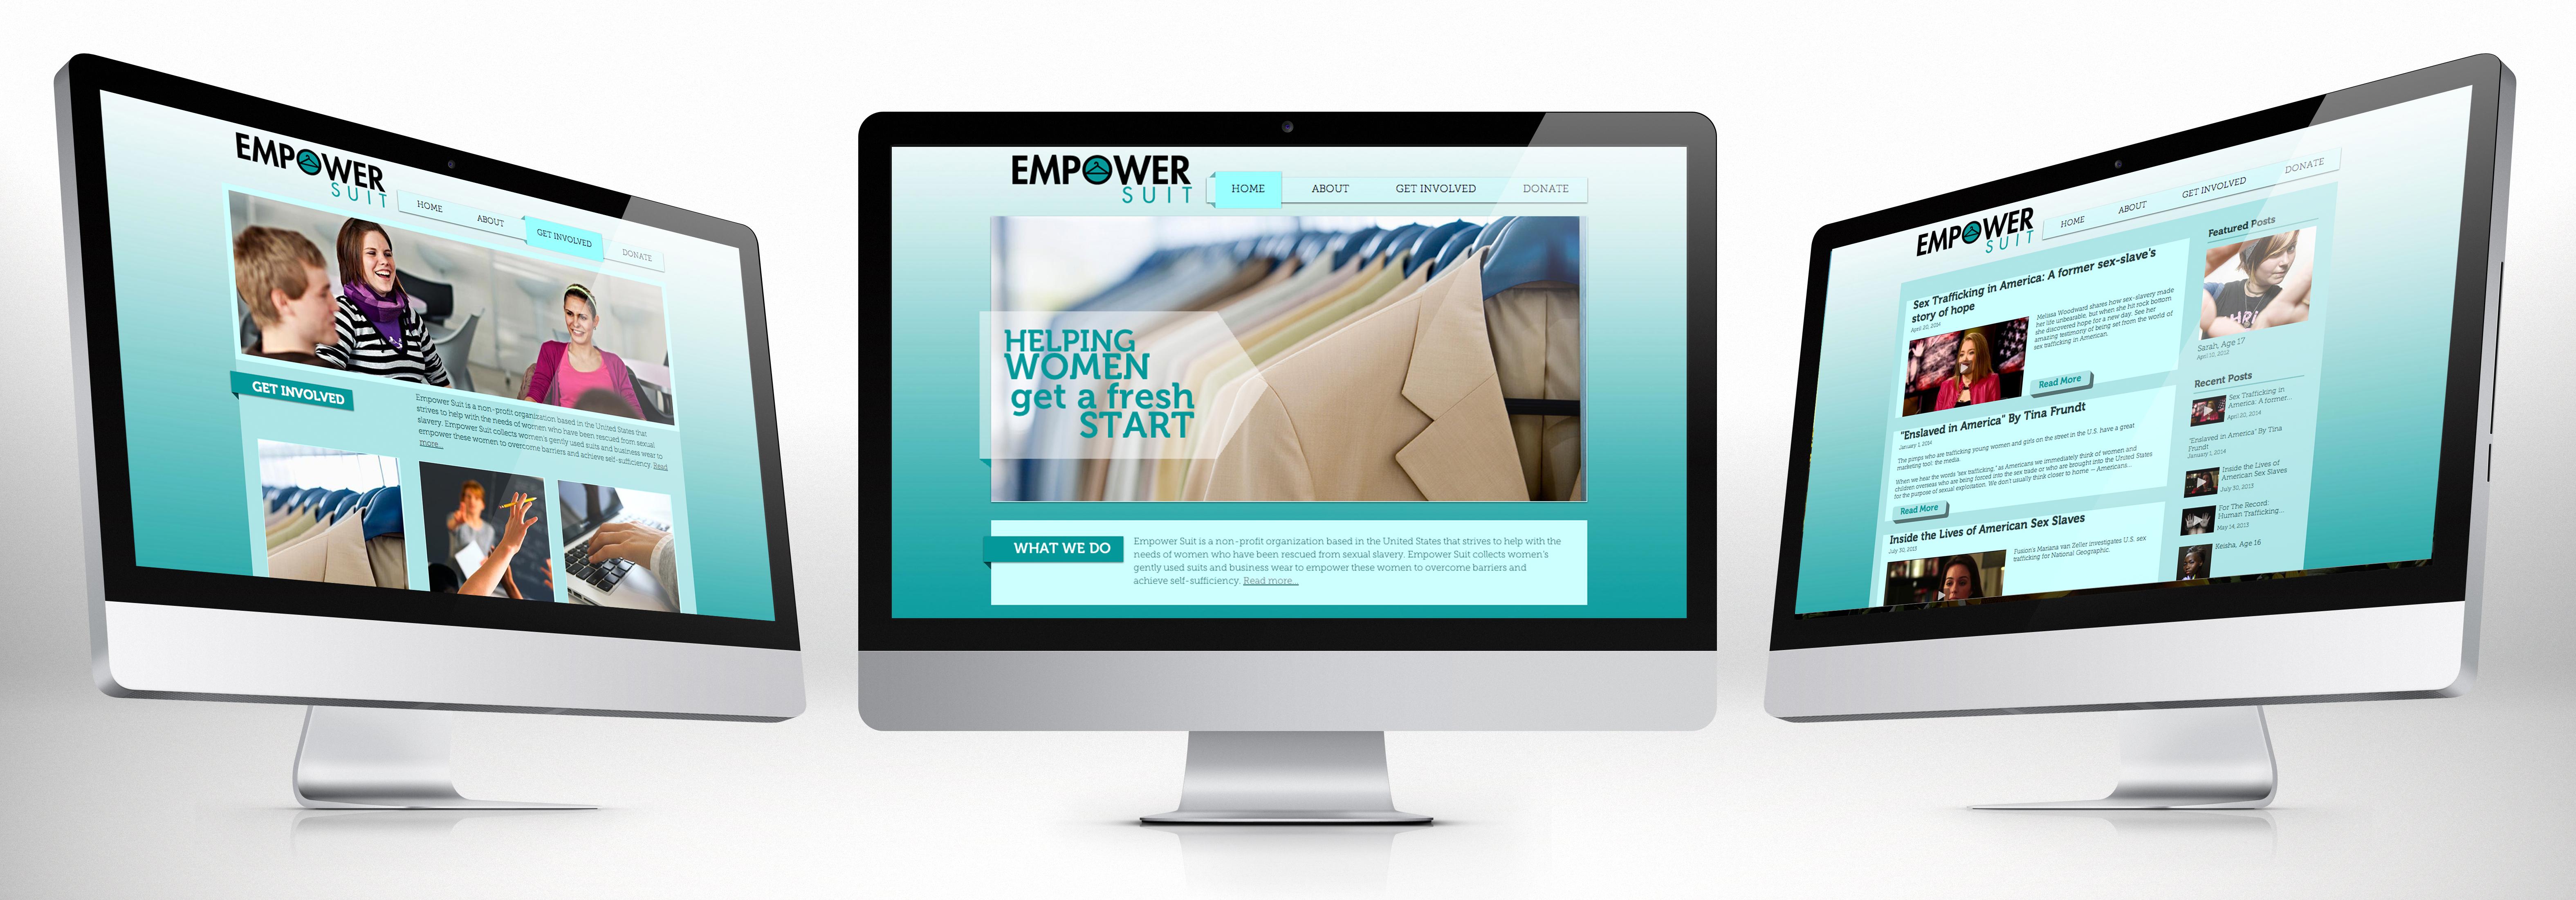 empowersuit_iMacmockup.jpg